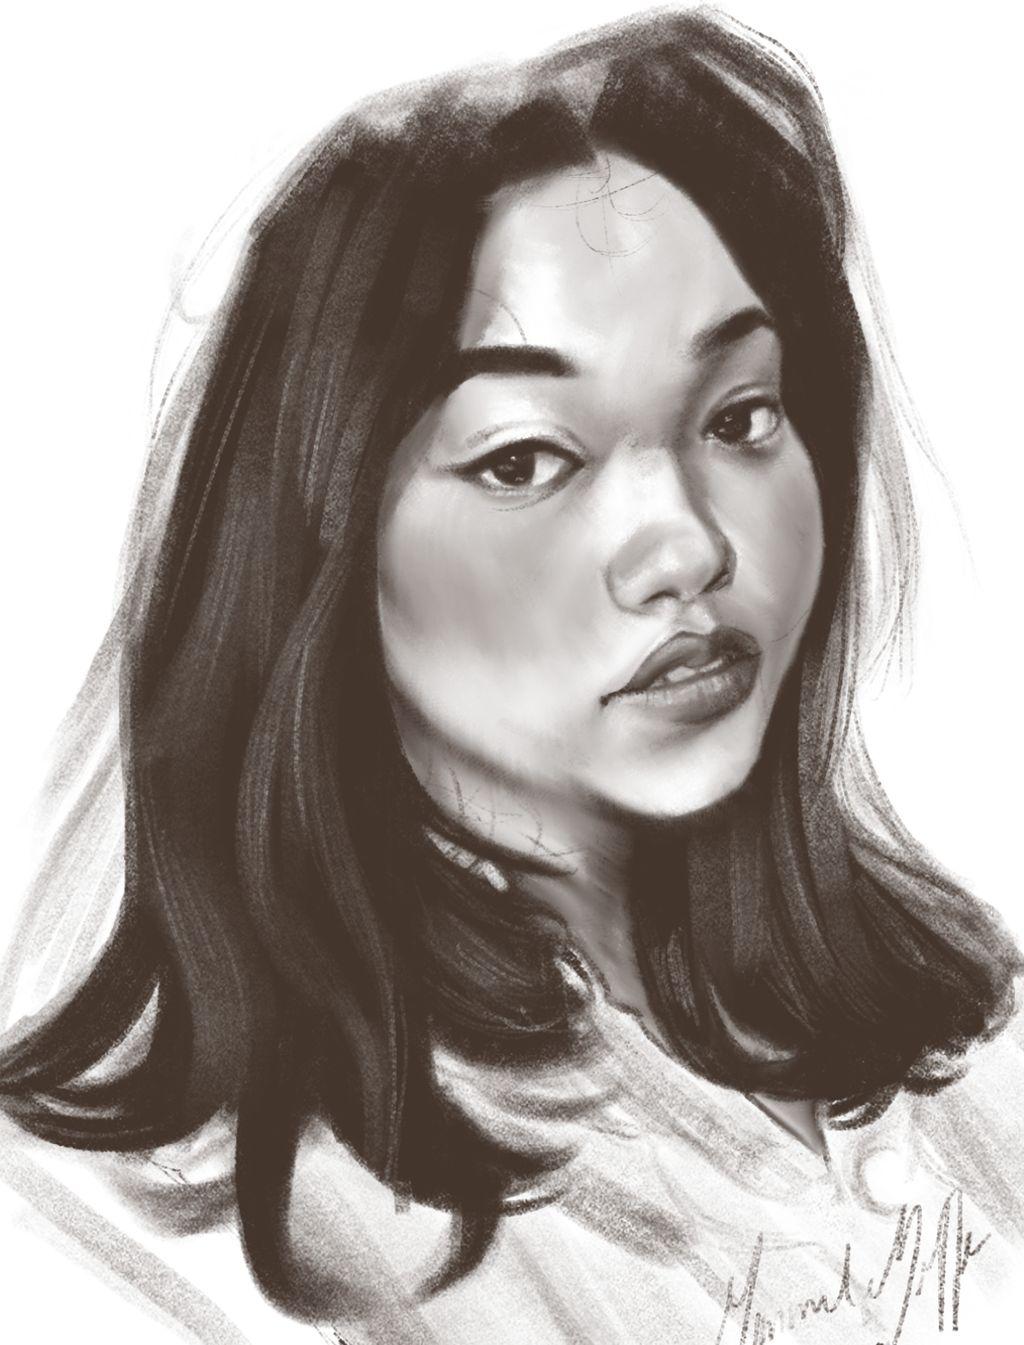 Realistic Monochromatic Digital Portrait